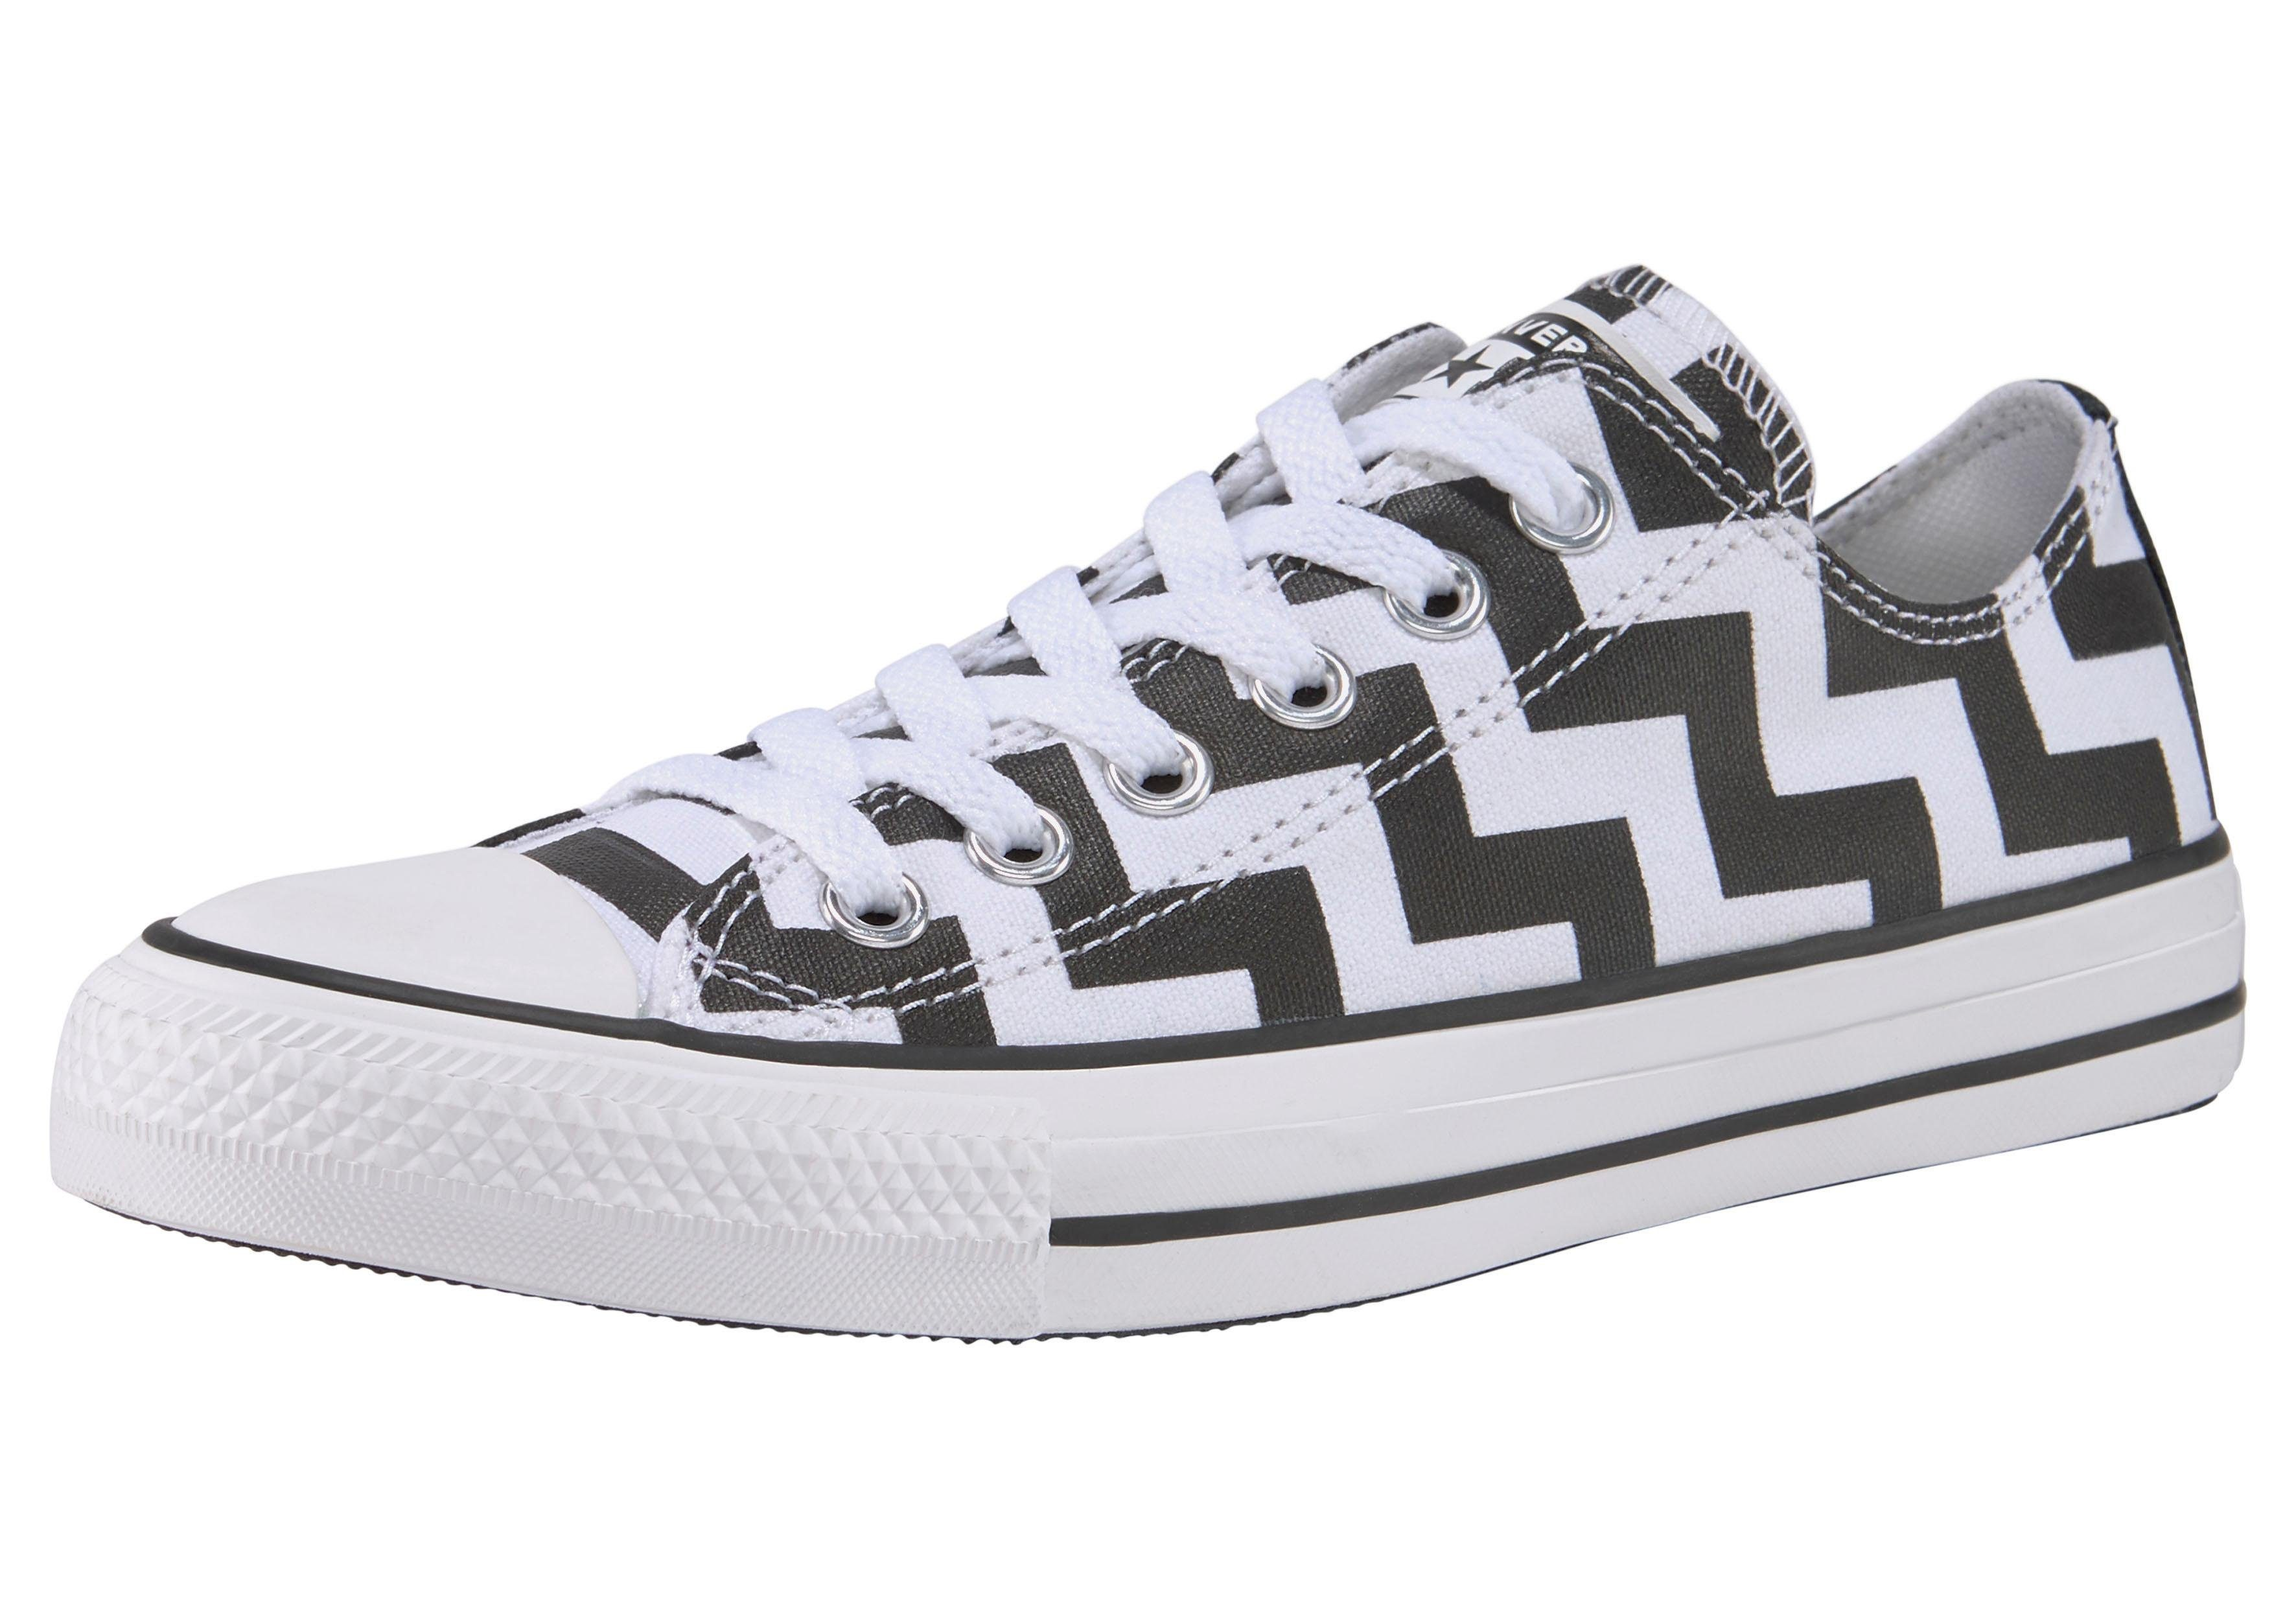 Converse »Chuck Taylor All Star GLAM DUNK Ox« Sneaker online kaufen | OTTO